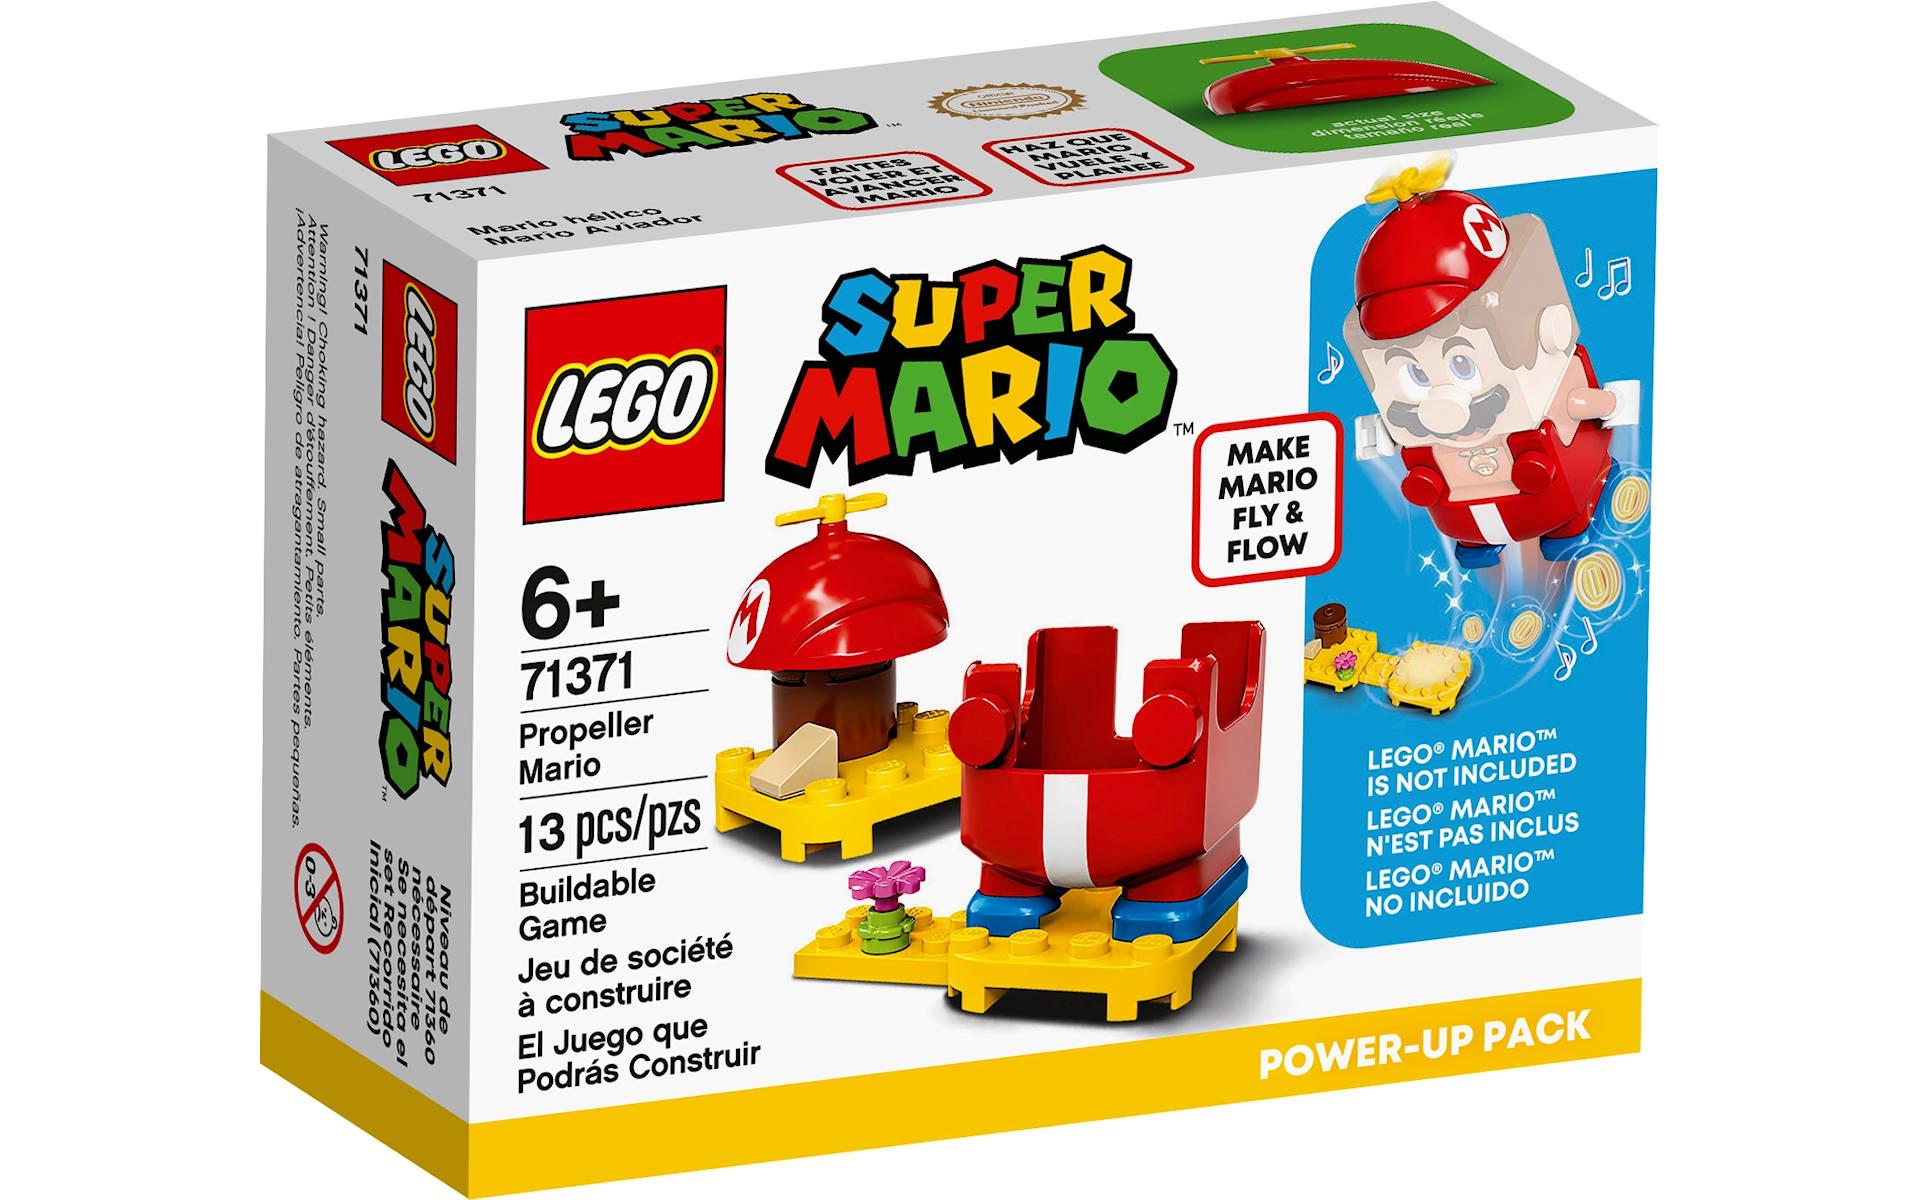 LEGO Super Mario Experience